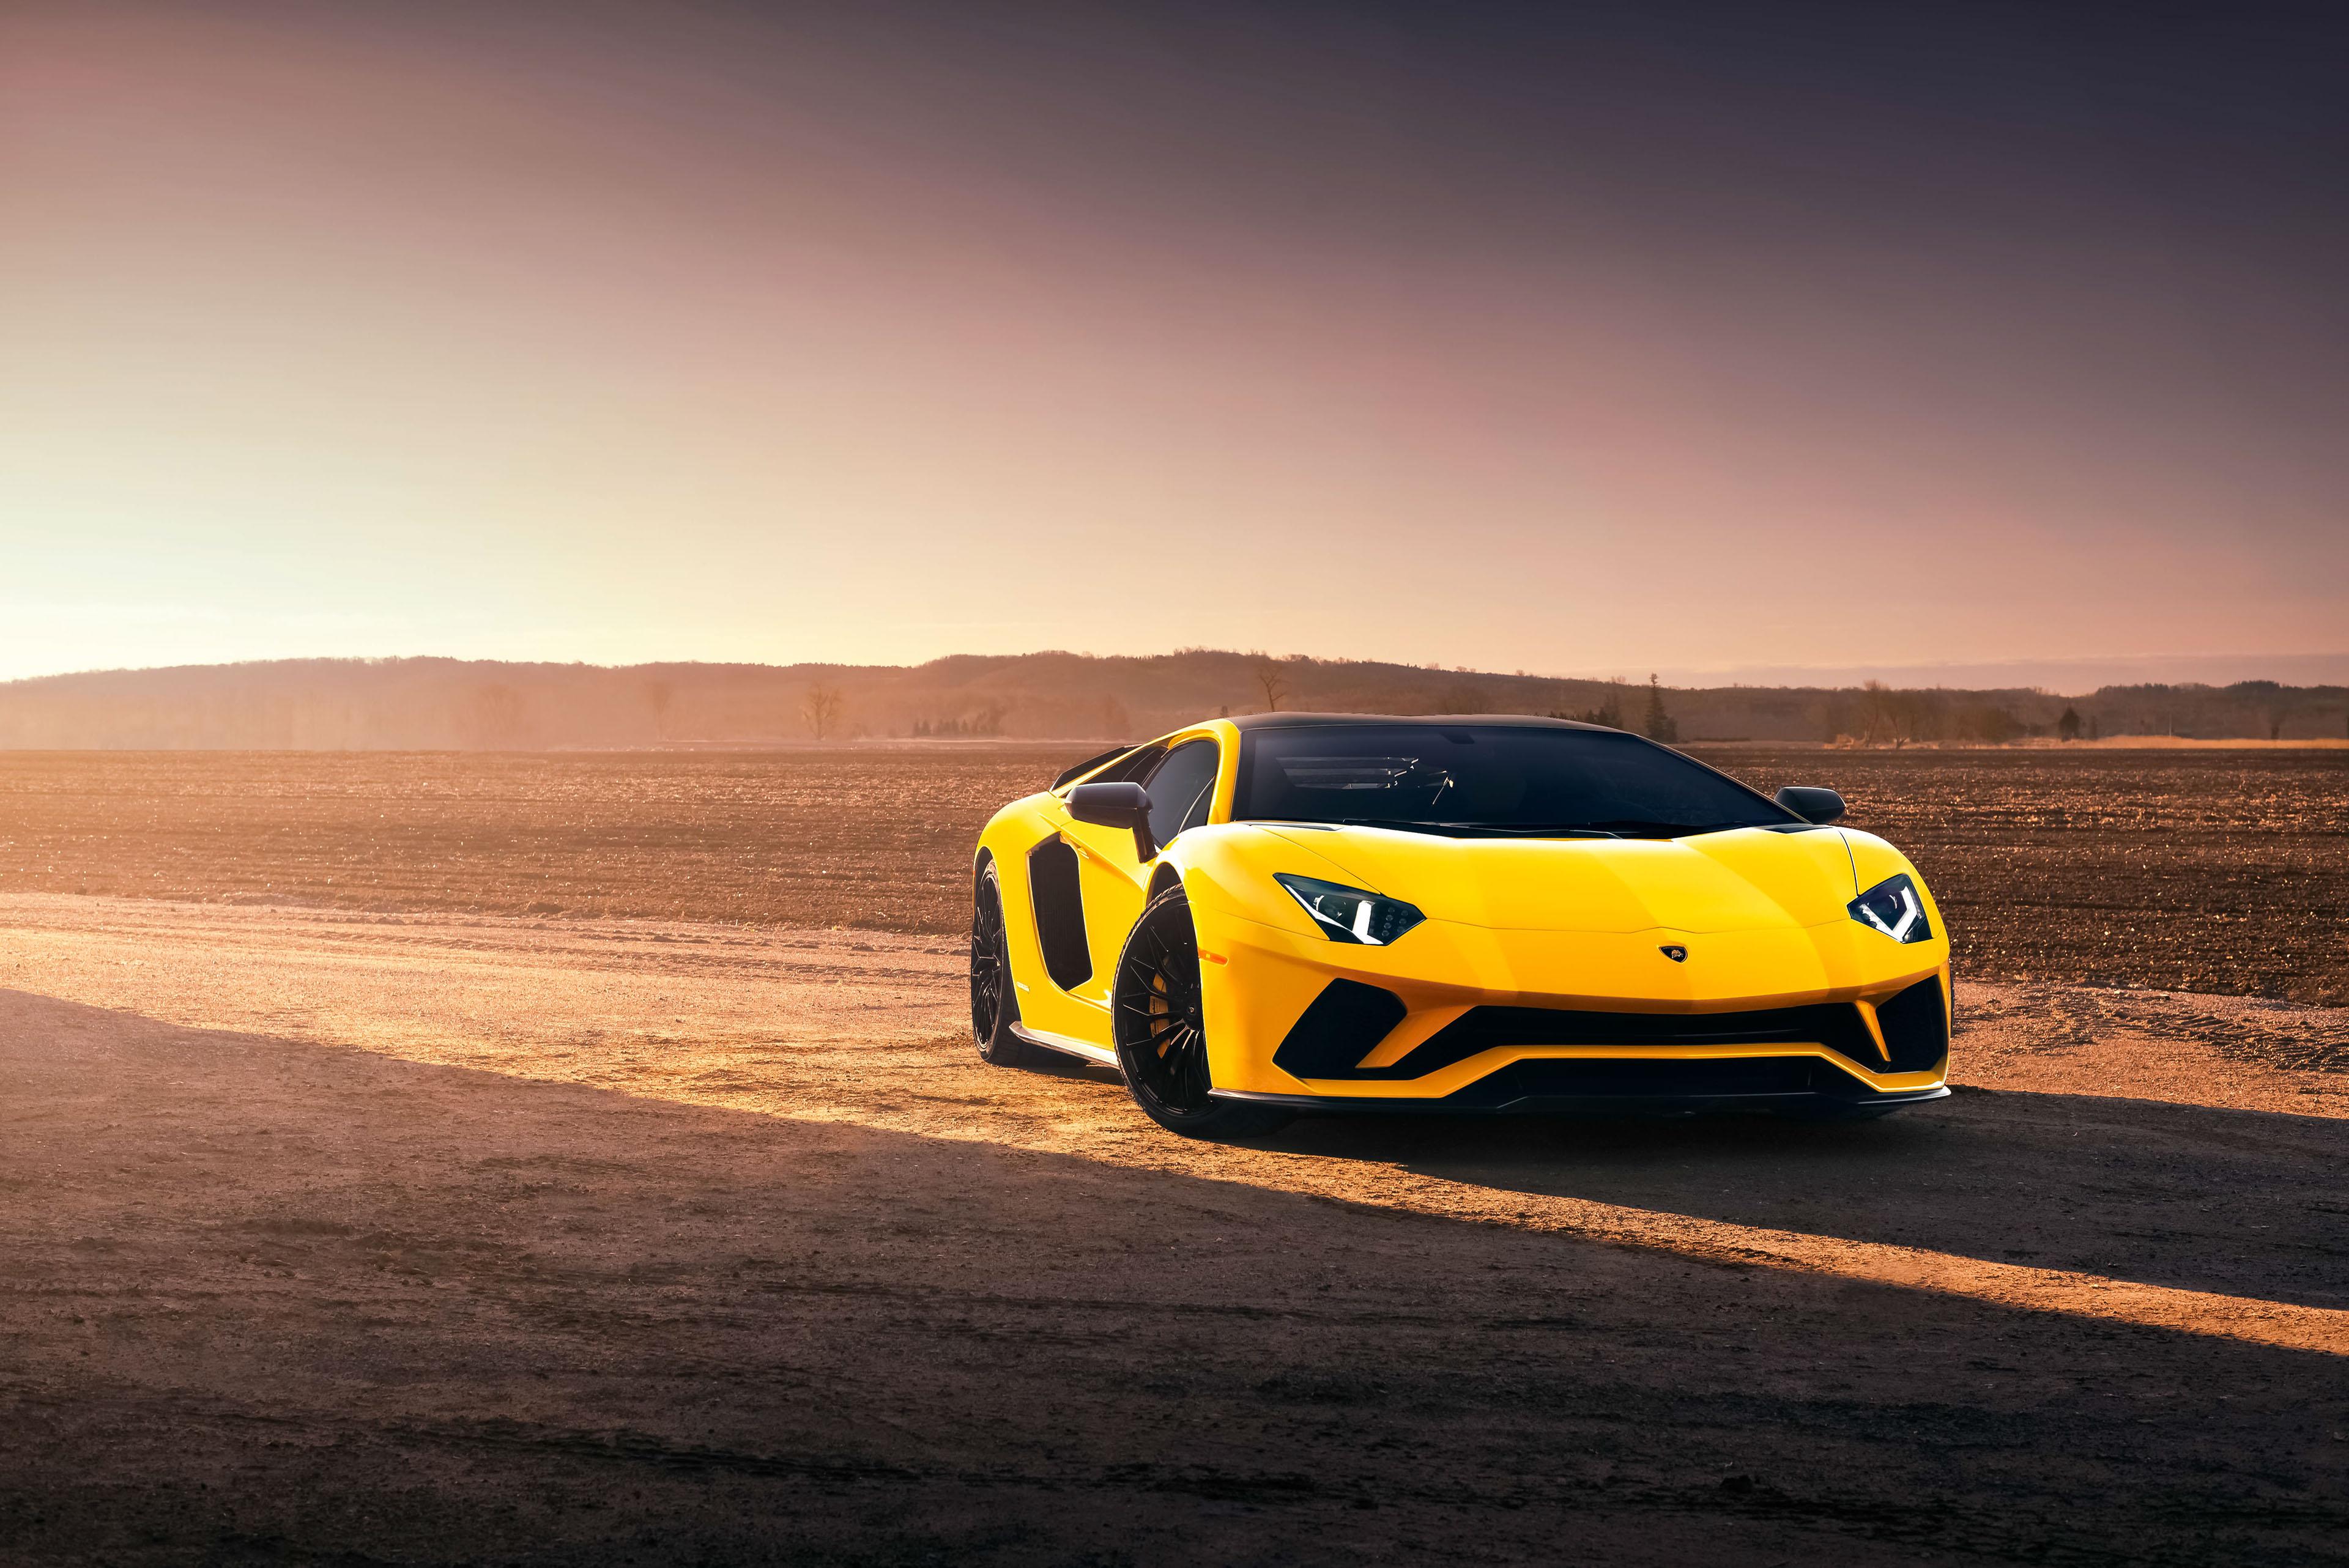 1280x1024 2018 Lamborghini Aventador S 4k 1280x1024 ...